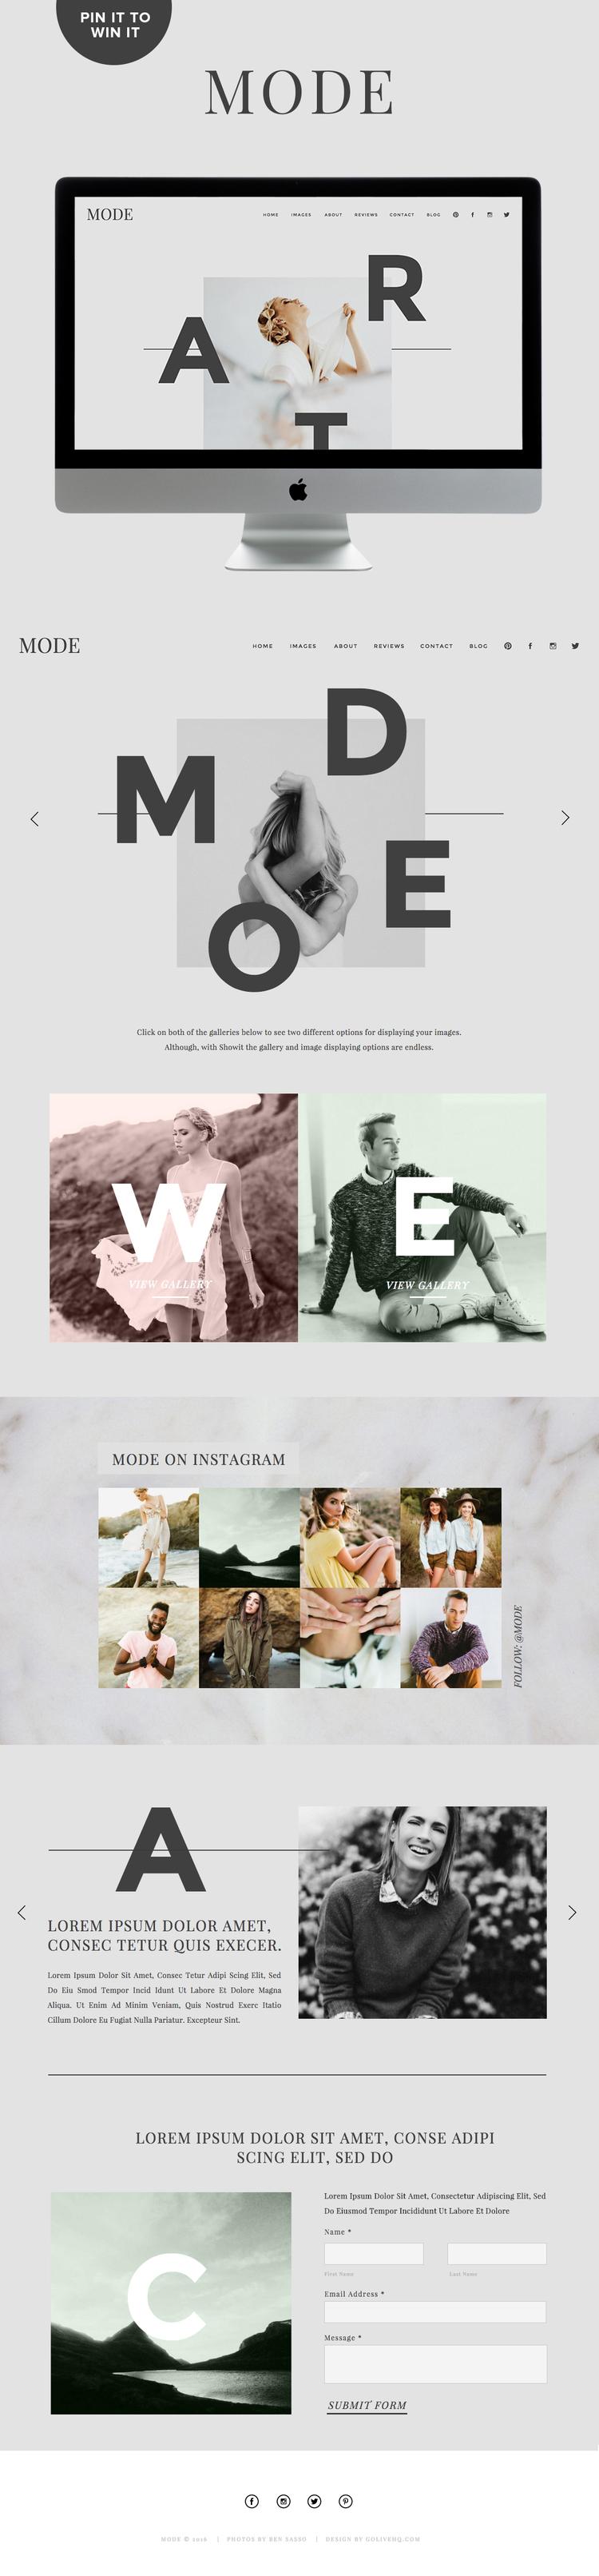 Showit5+website+theme+inspiration+_+by+GOLIVEHQ.jpg